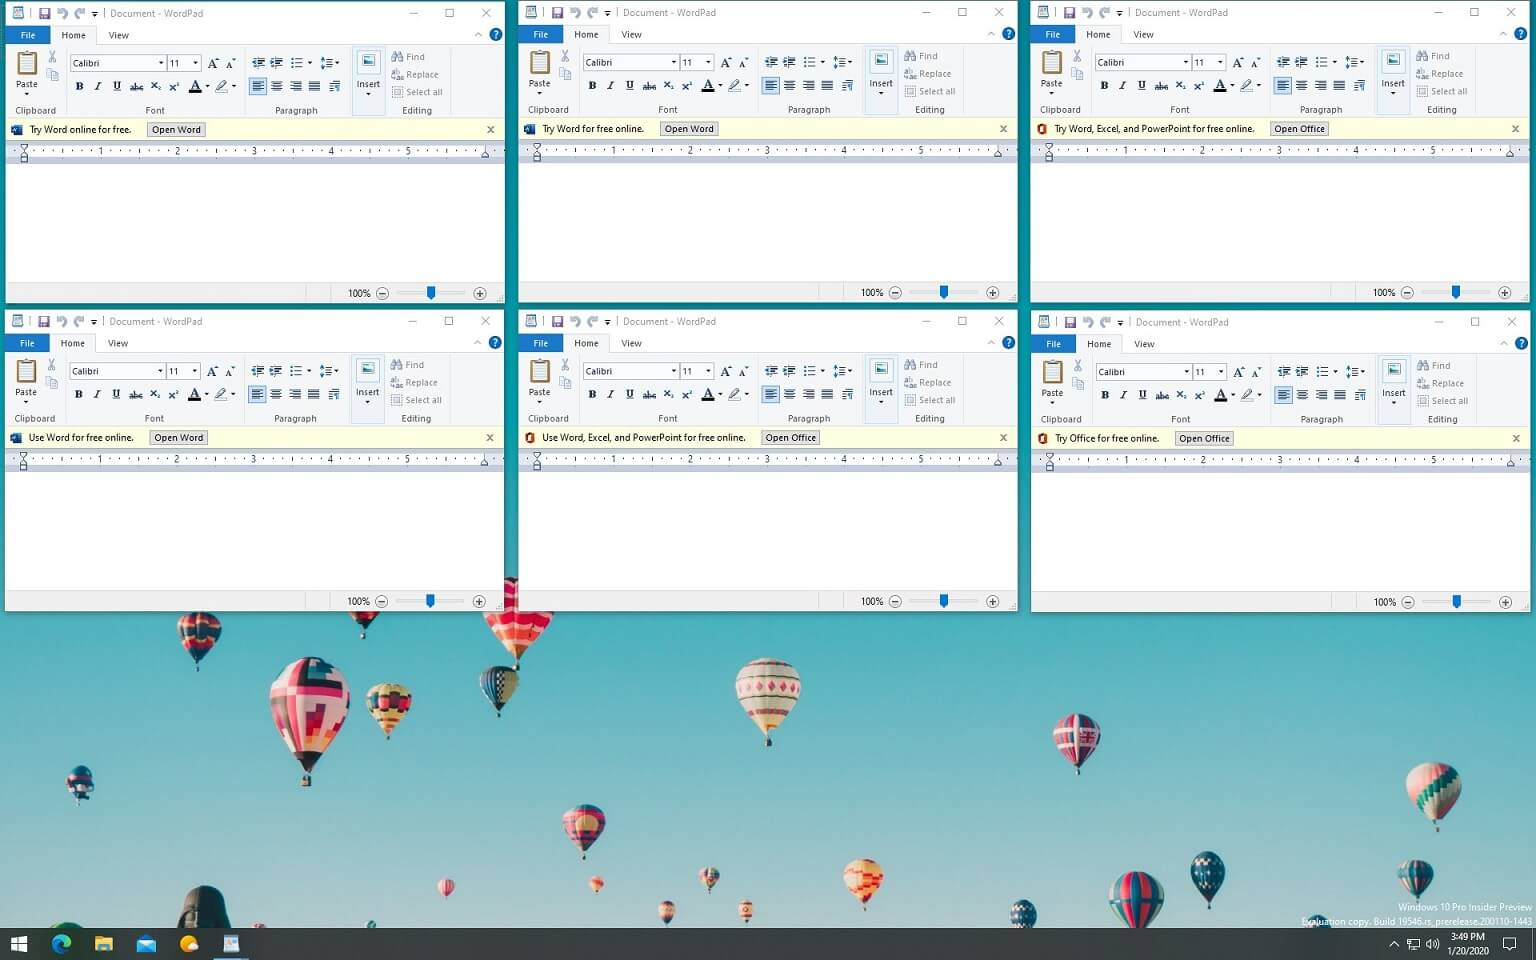 WordPad advertisement